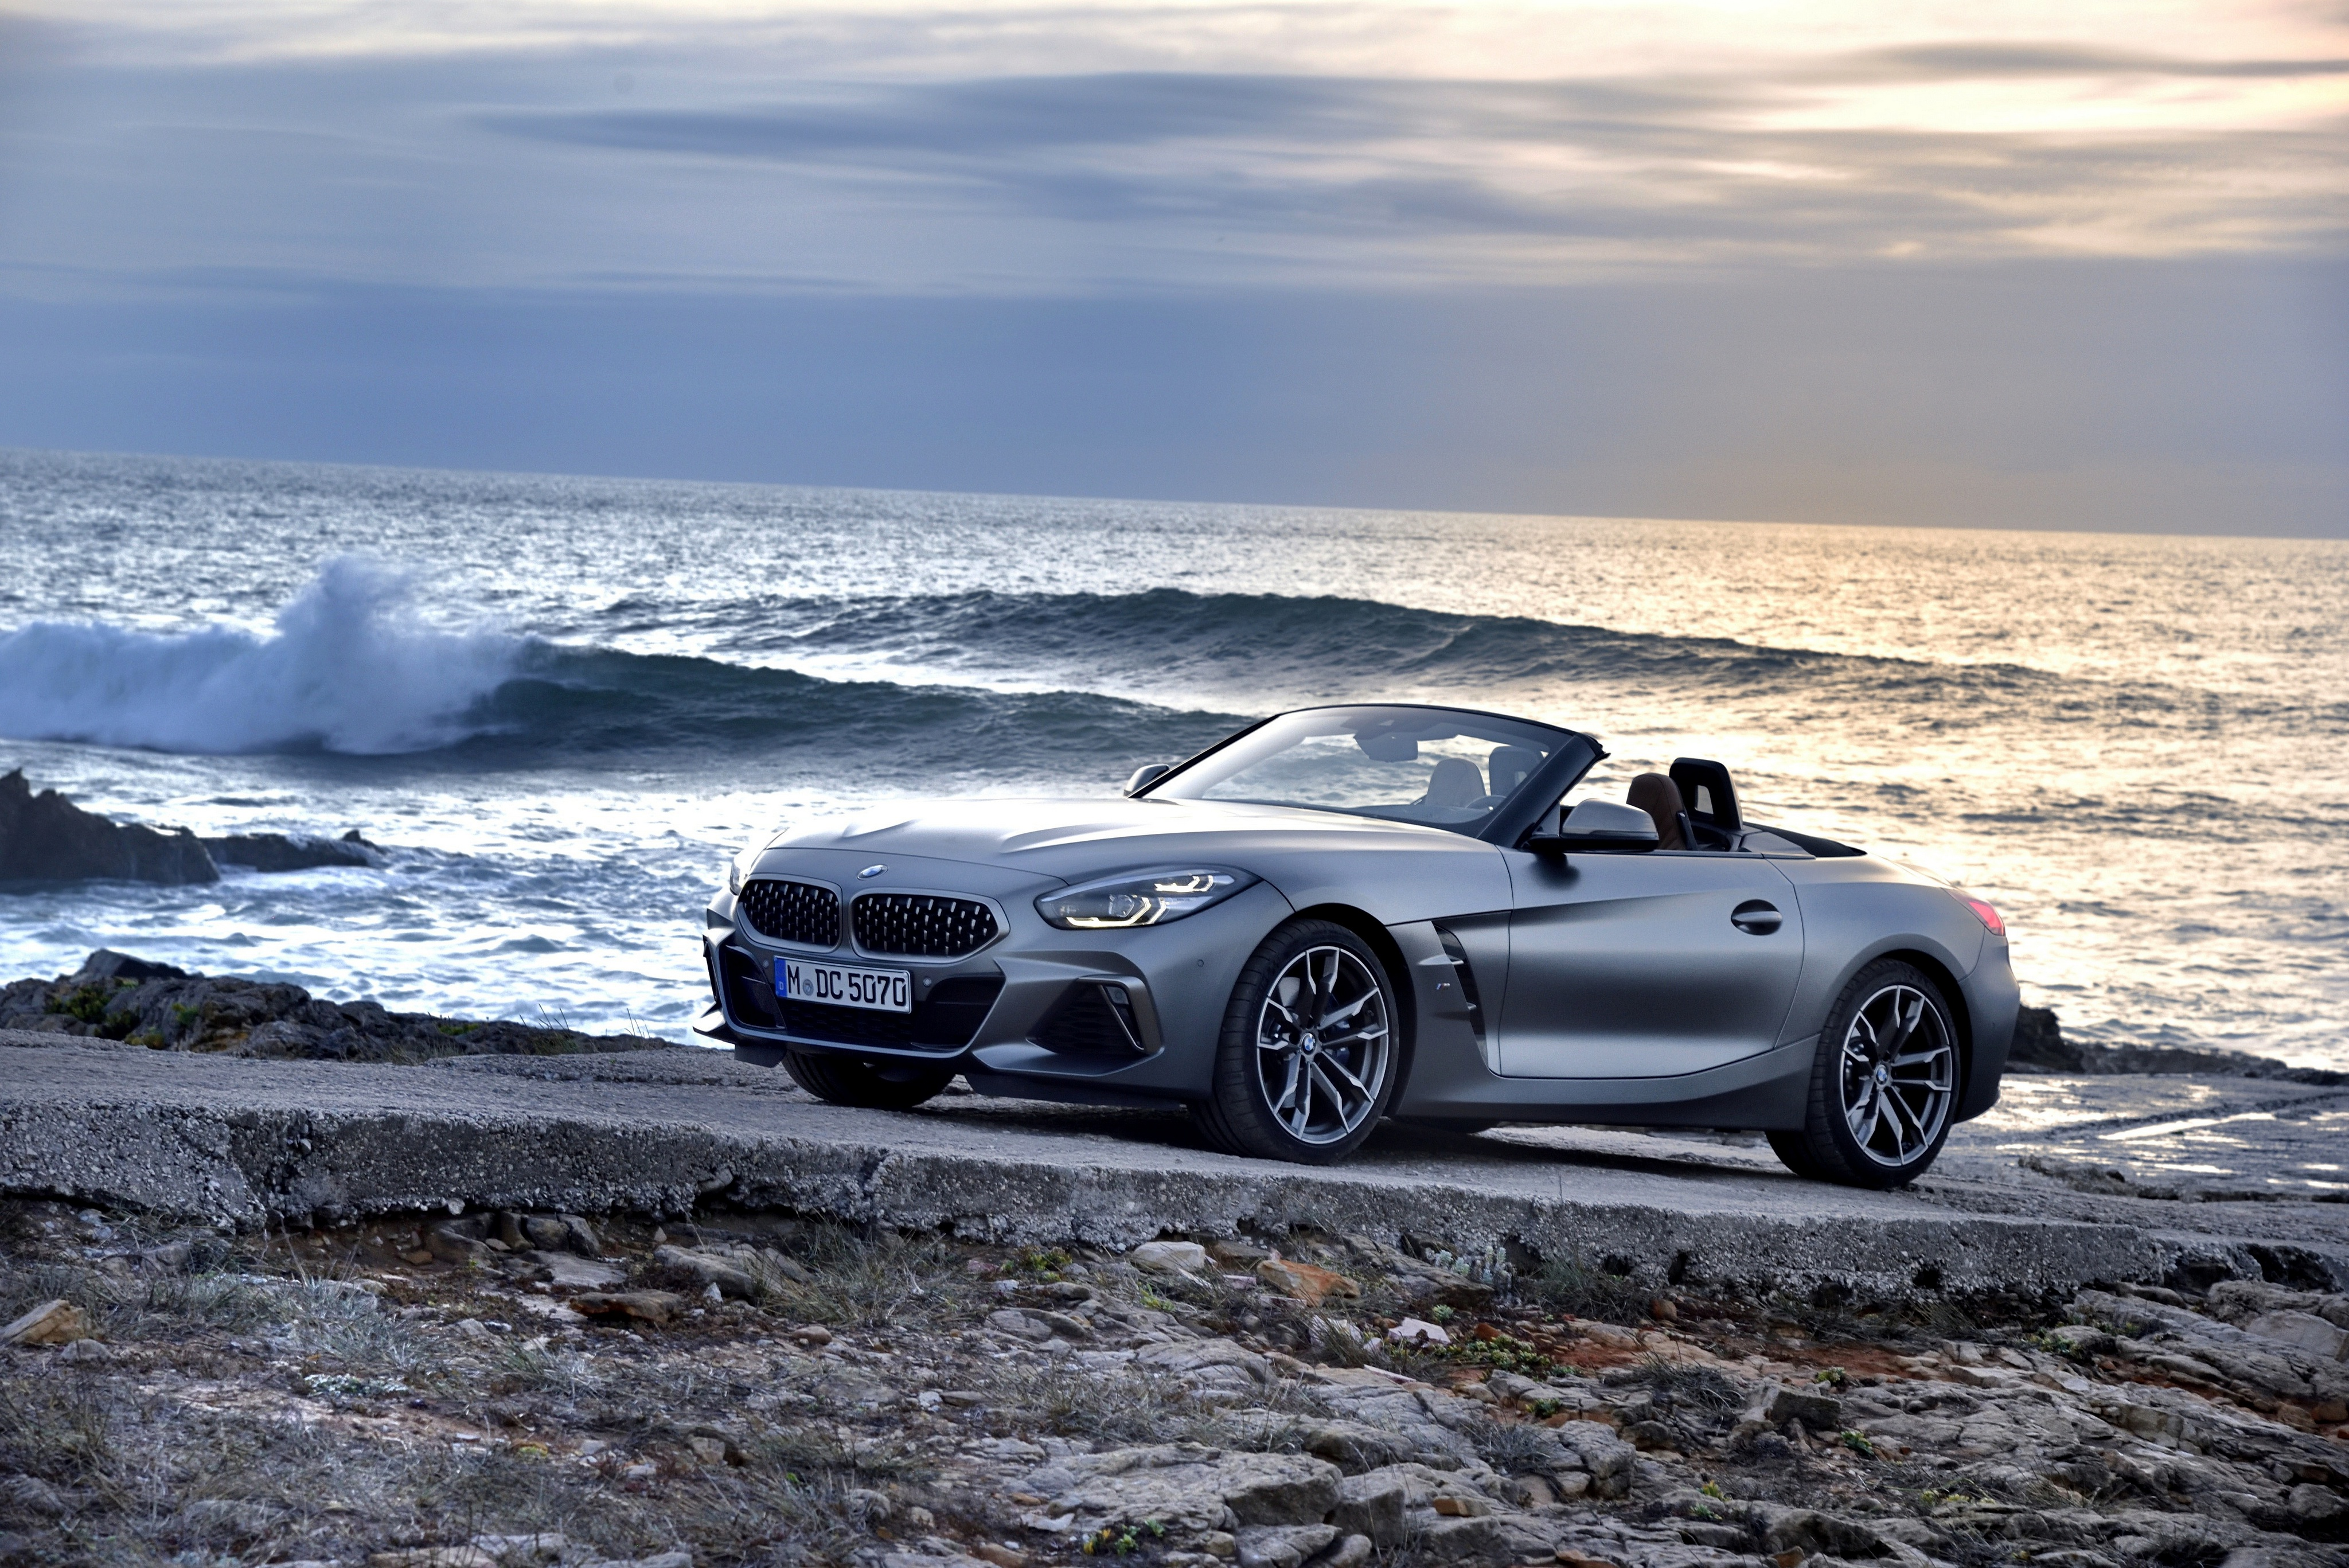 A Grey Bmw Z4 Parked Near The Oceanside 4k Ultra Fondo De